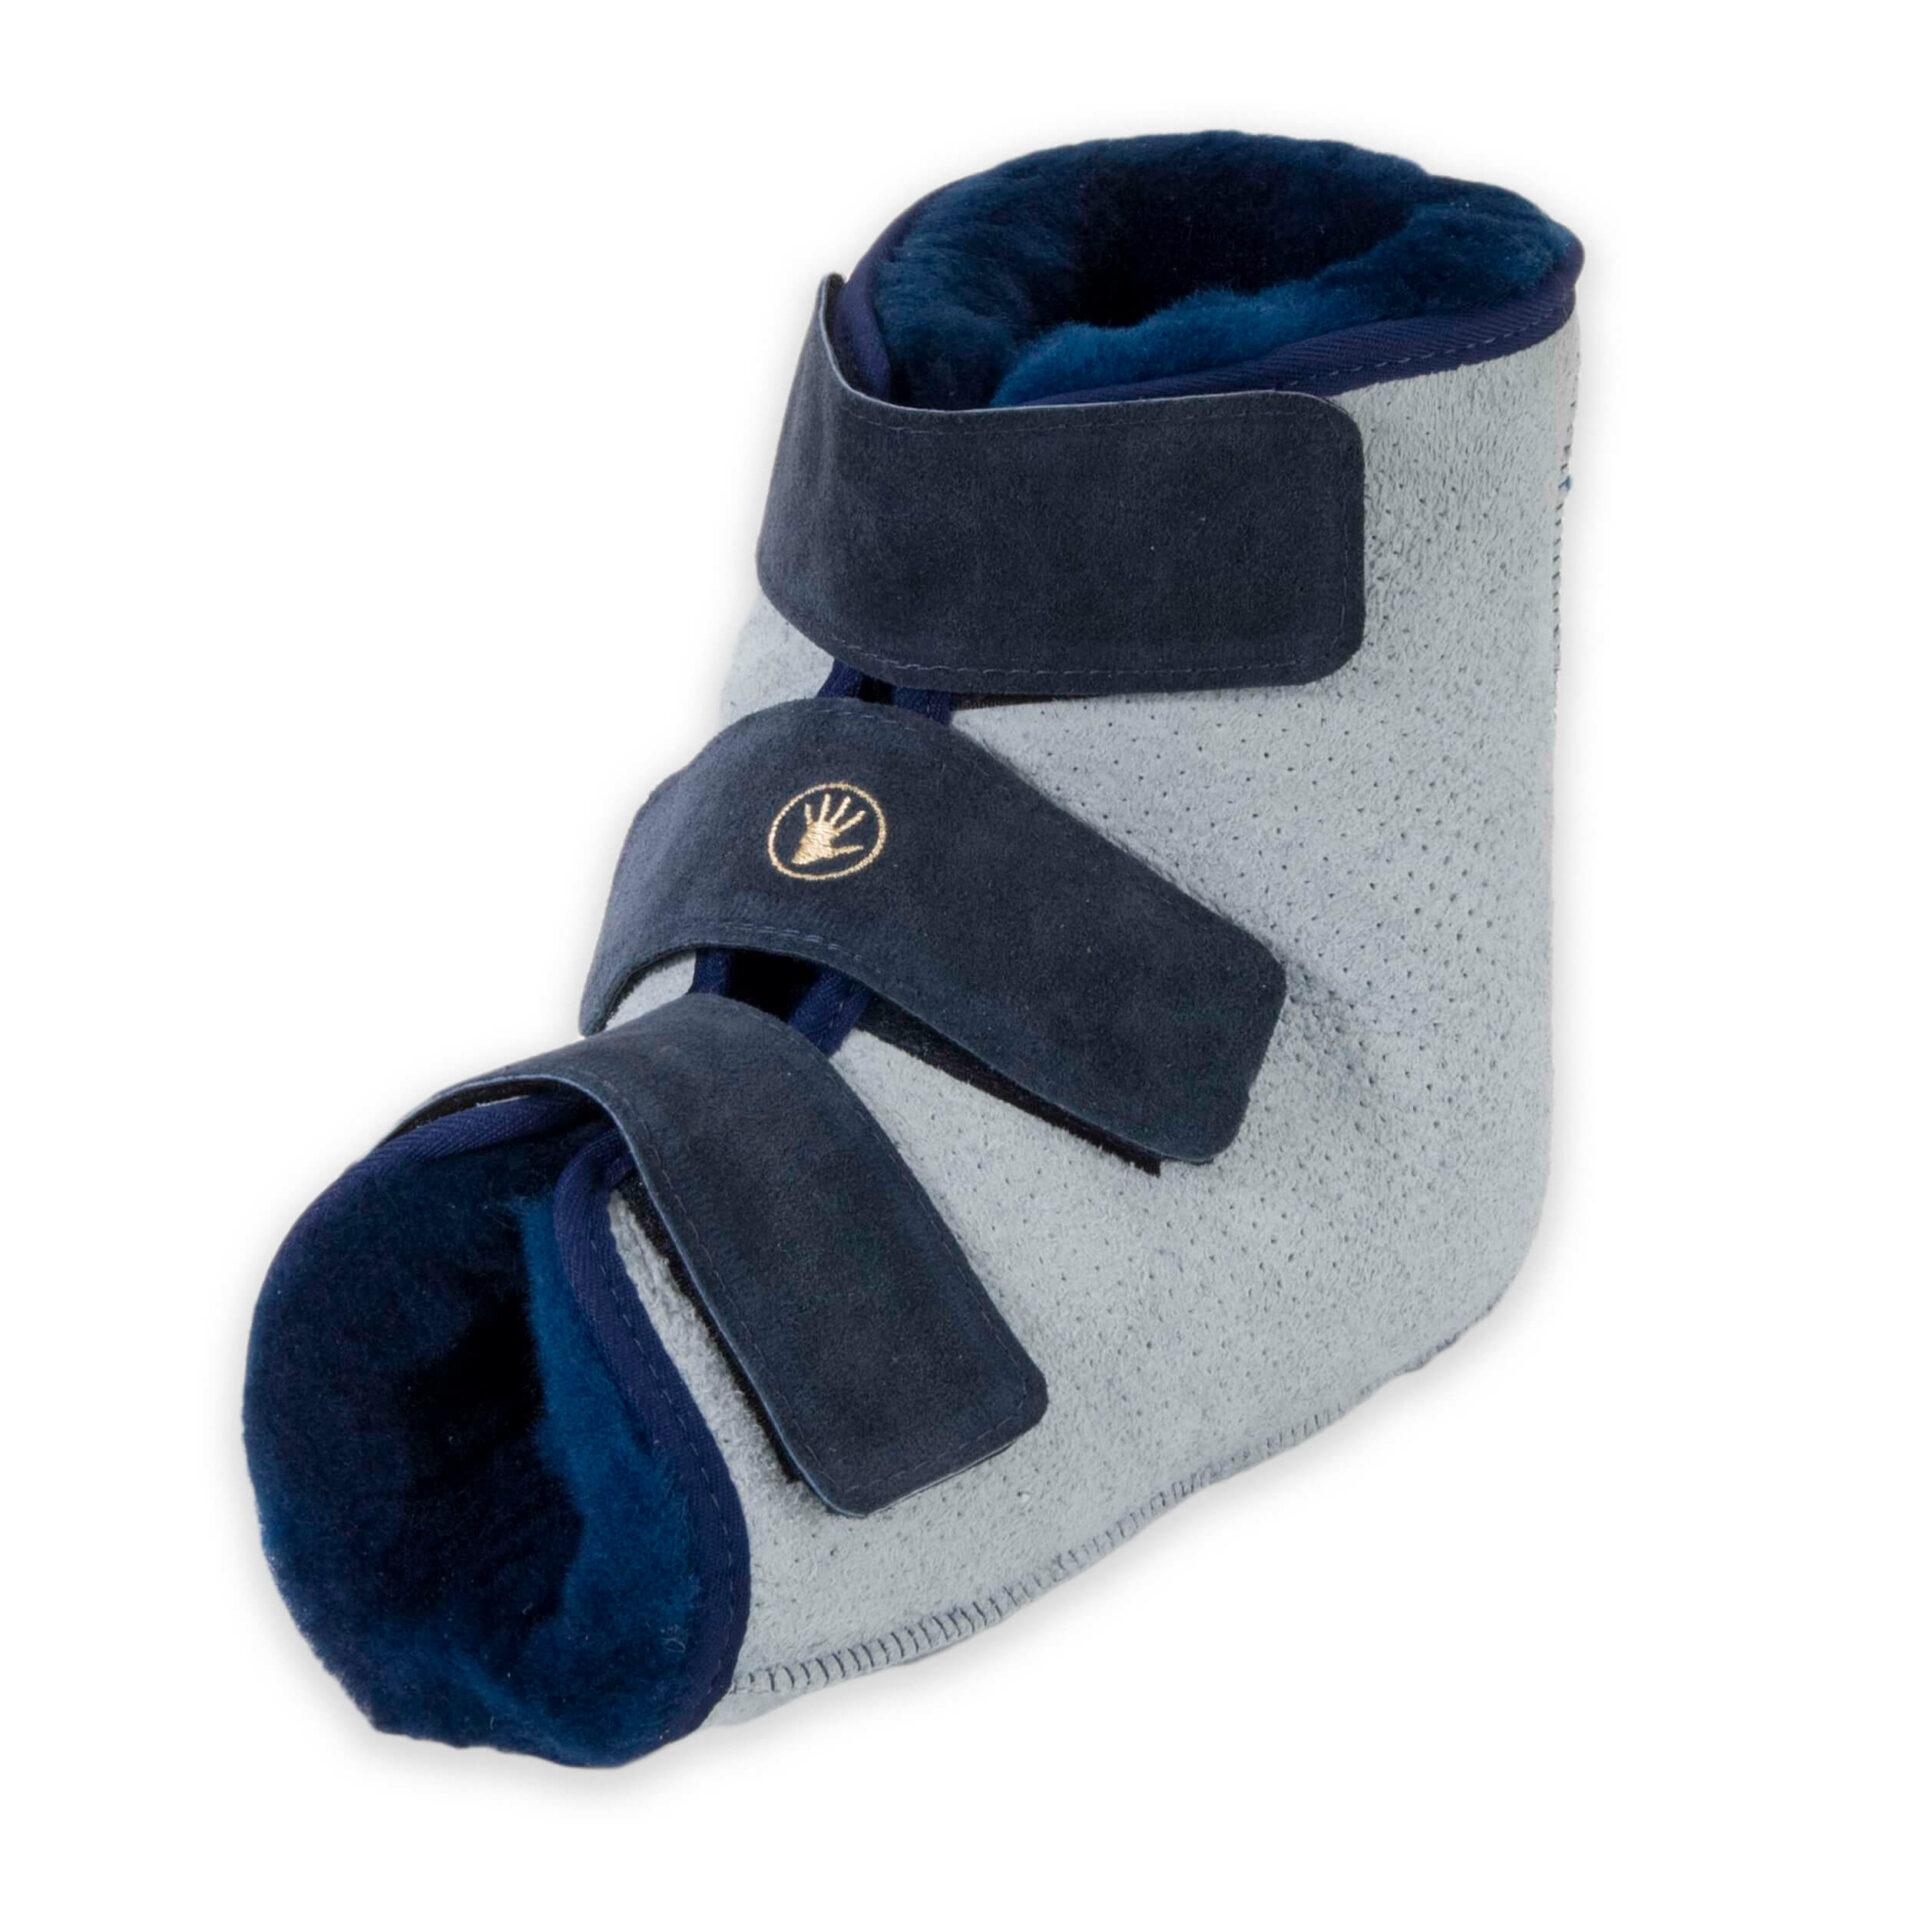 Sheepskin Foot Protector